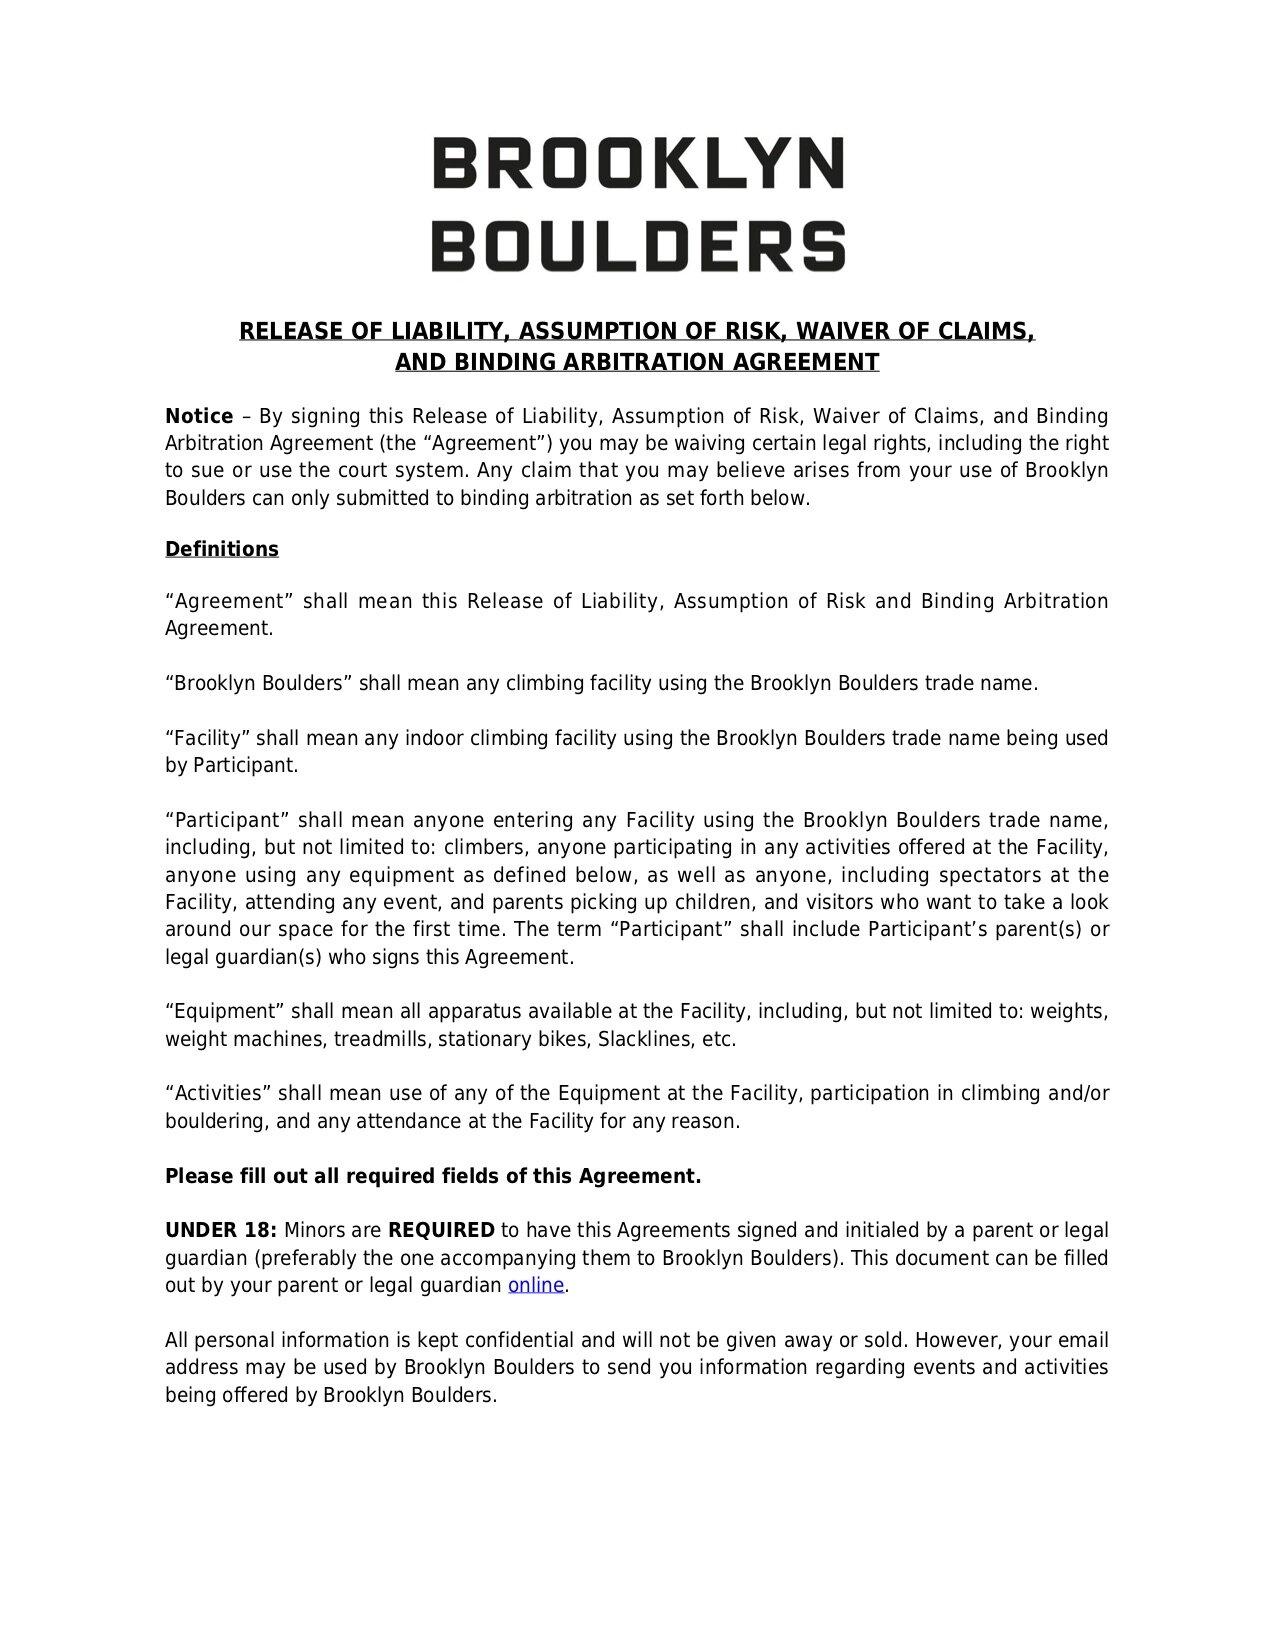 Copy of Brooklyn Boulders Somerville Waiver.jpg